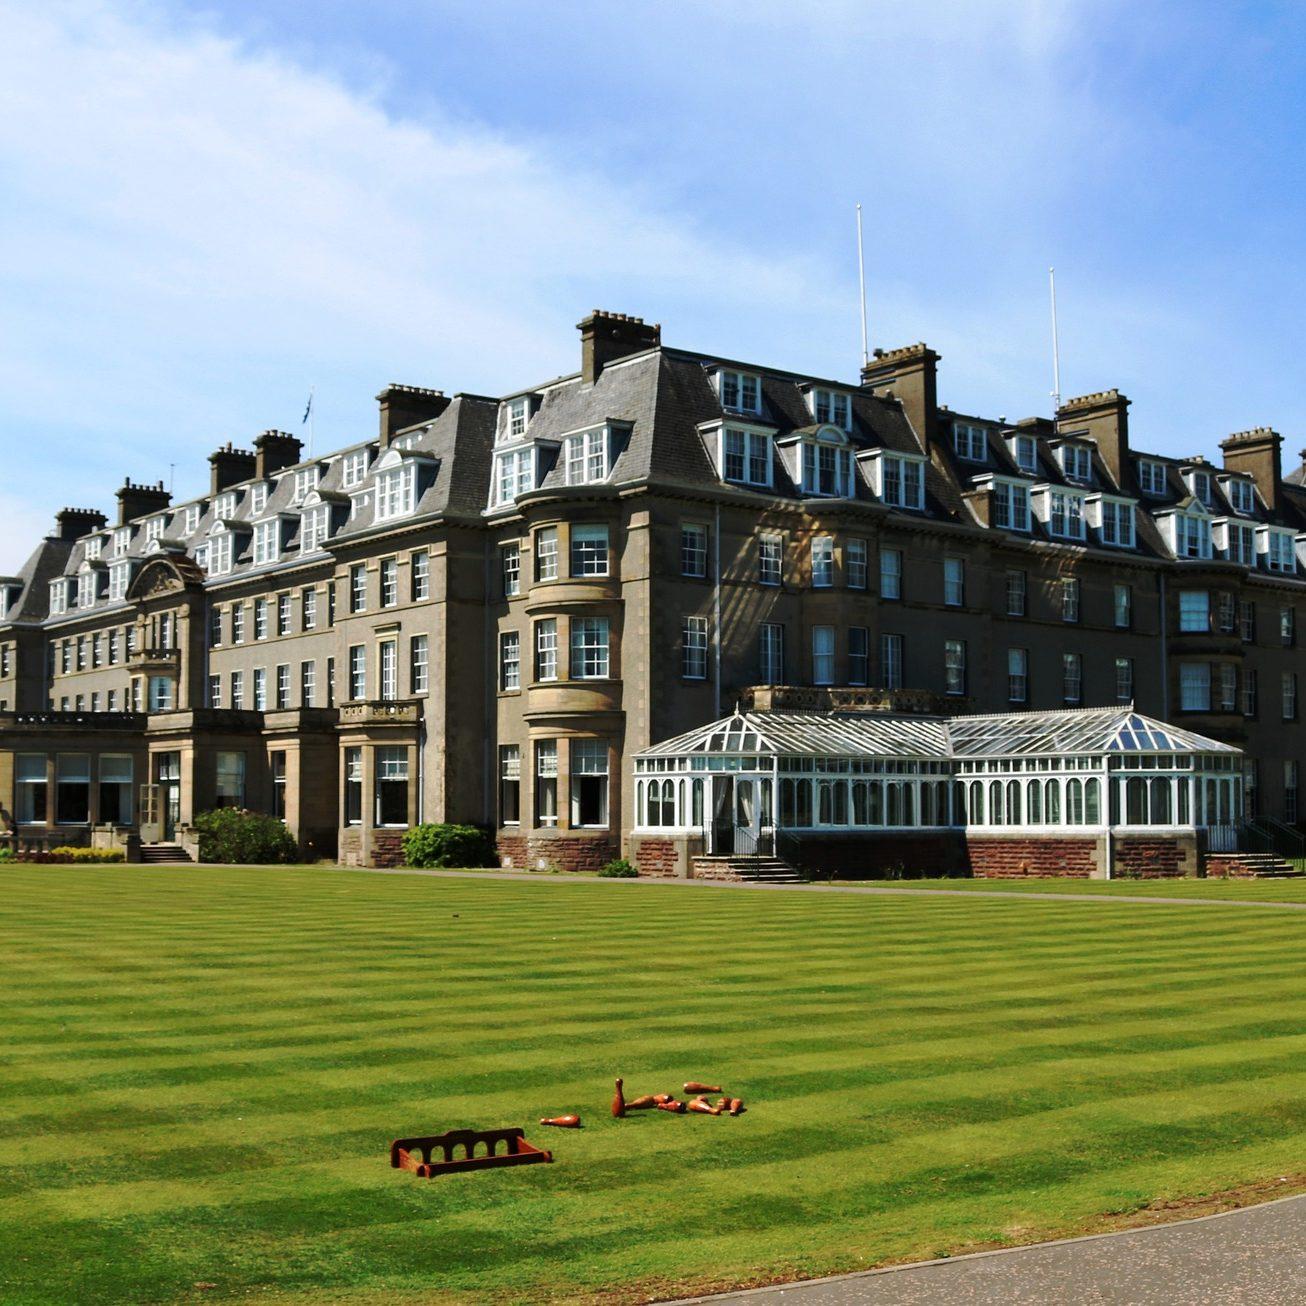 gleneagles-hotel-3434943_1920